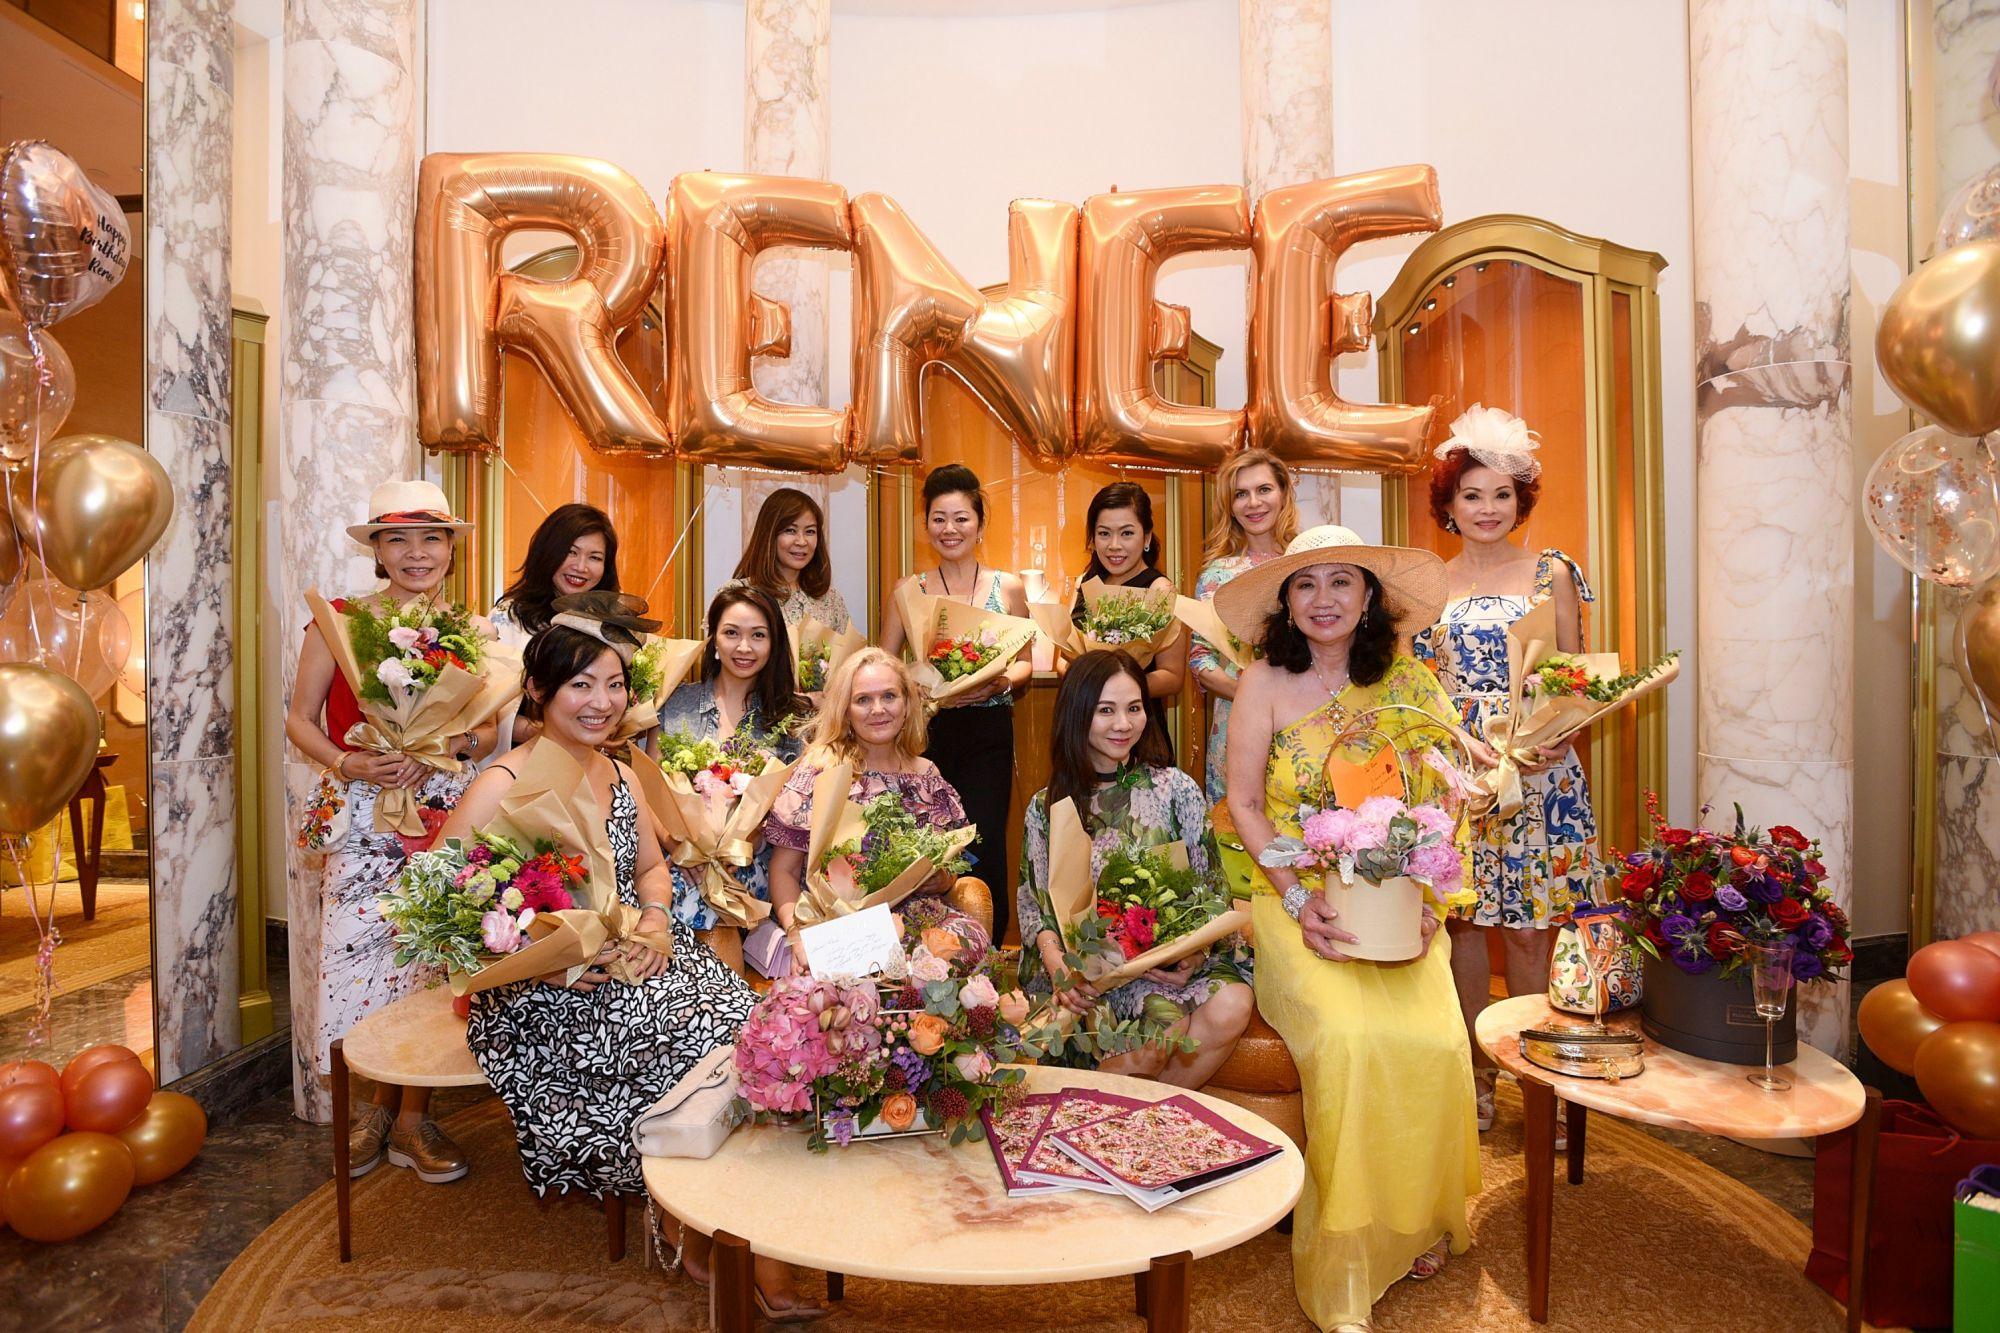 Grace Wong, Jessie Ho-Thong, Alicia Thian, Serene Sorensen, Alpha Cheah, Paulina Böhm, Linda Soo-Tan, Ching Lock Yuen, Kelly Keak, Mette Hartmann, Jacelyn Lai, Renee Tan